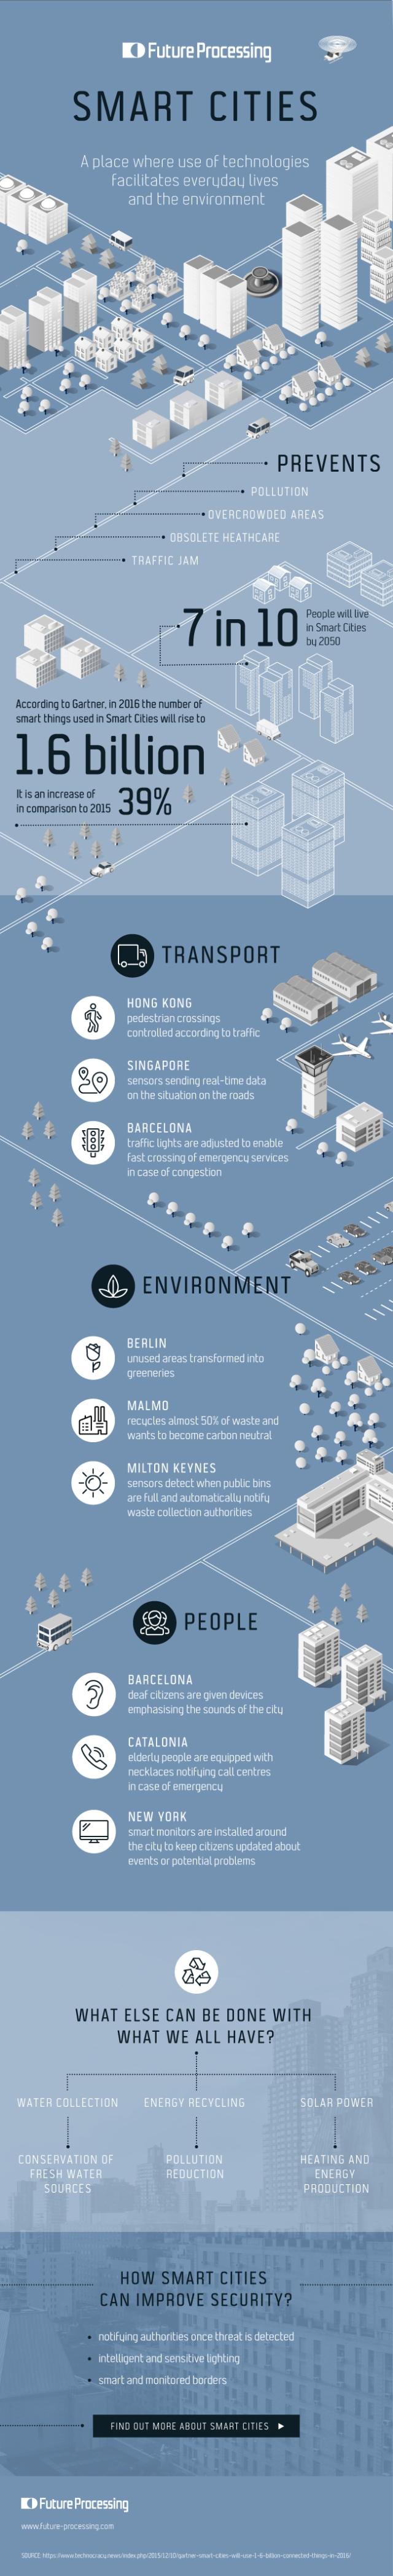 smartcities_infografika-Internet-Of-Things.jpg